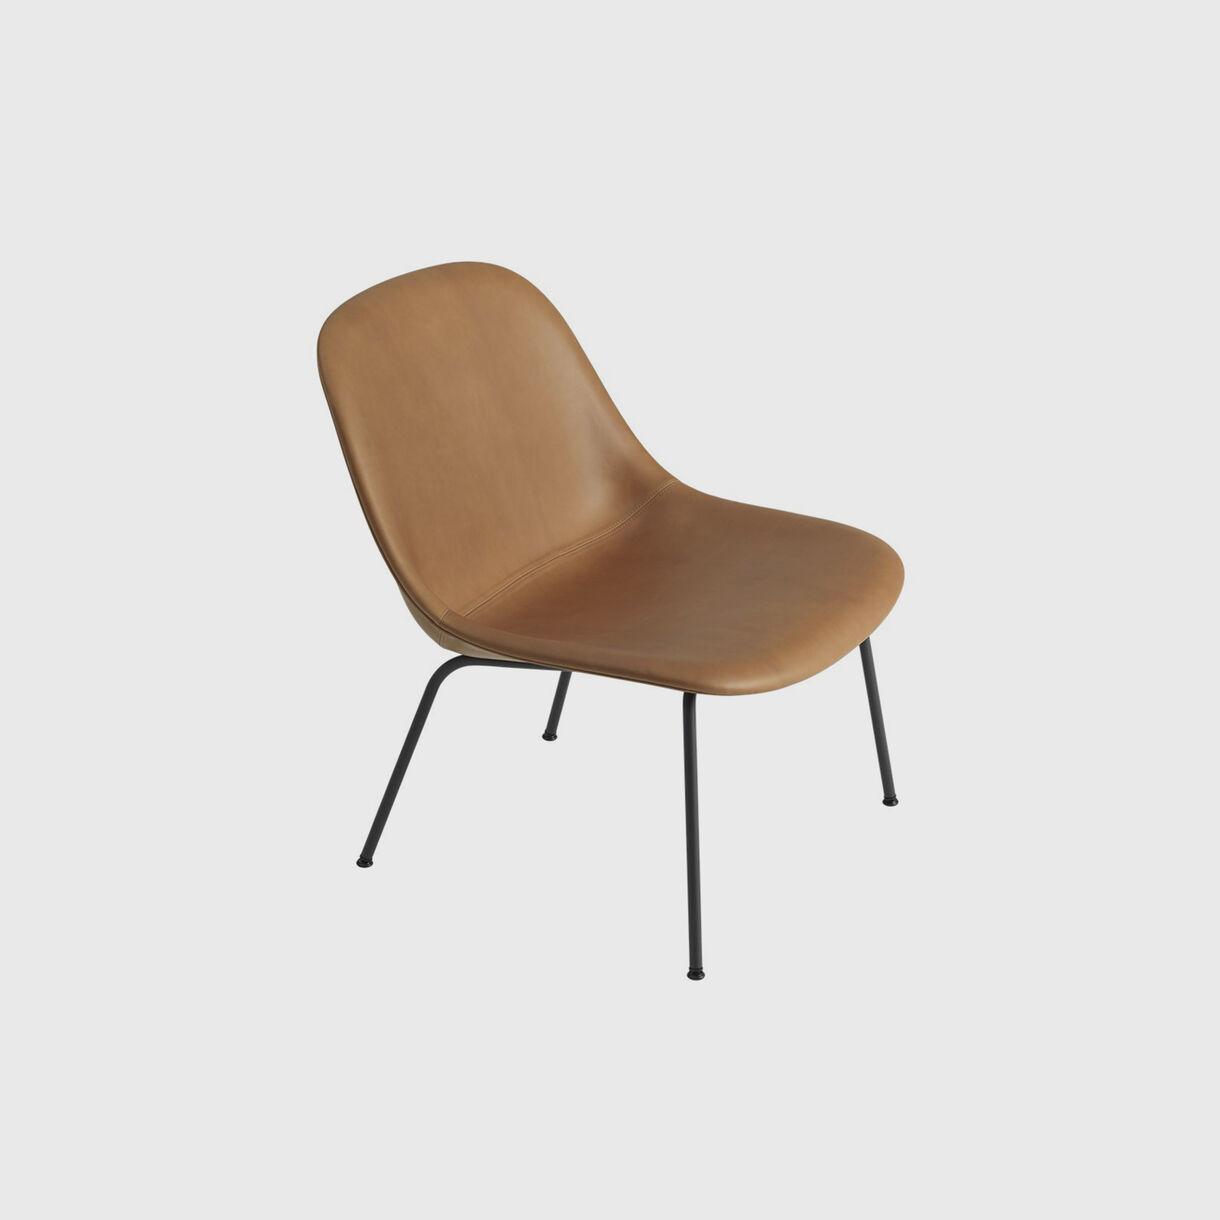 Fiber Lounge Chair Tube Base, Upholstered, Cognac Leather